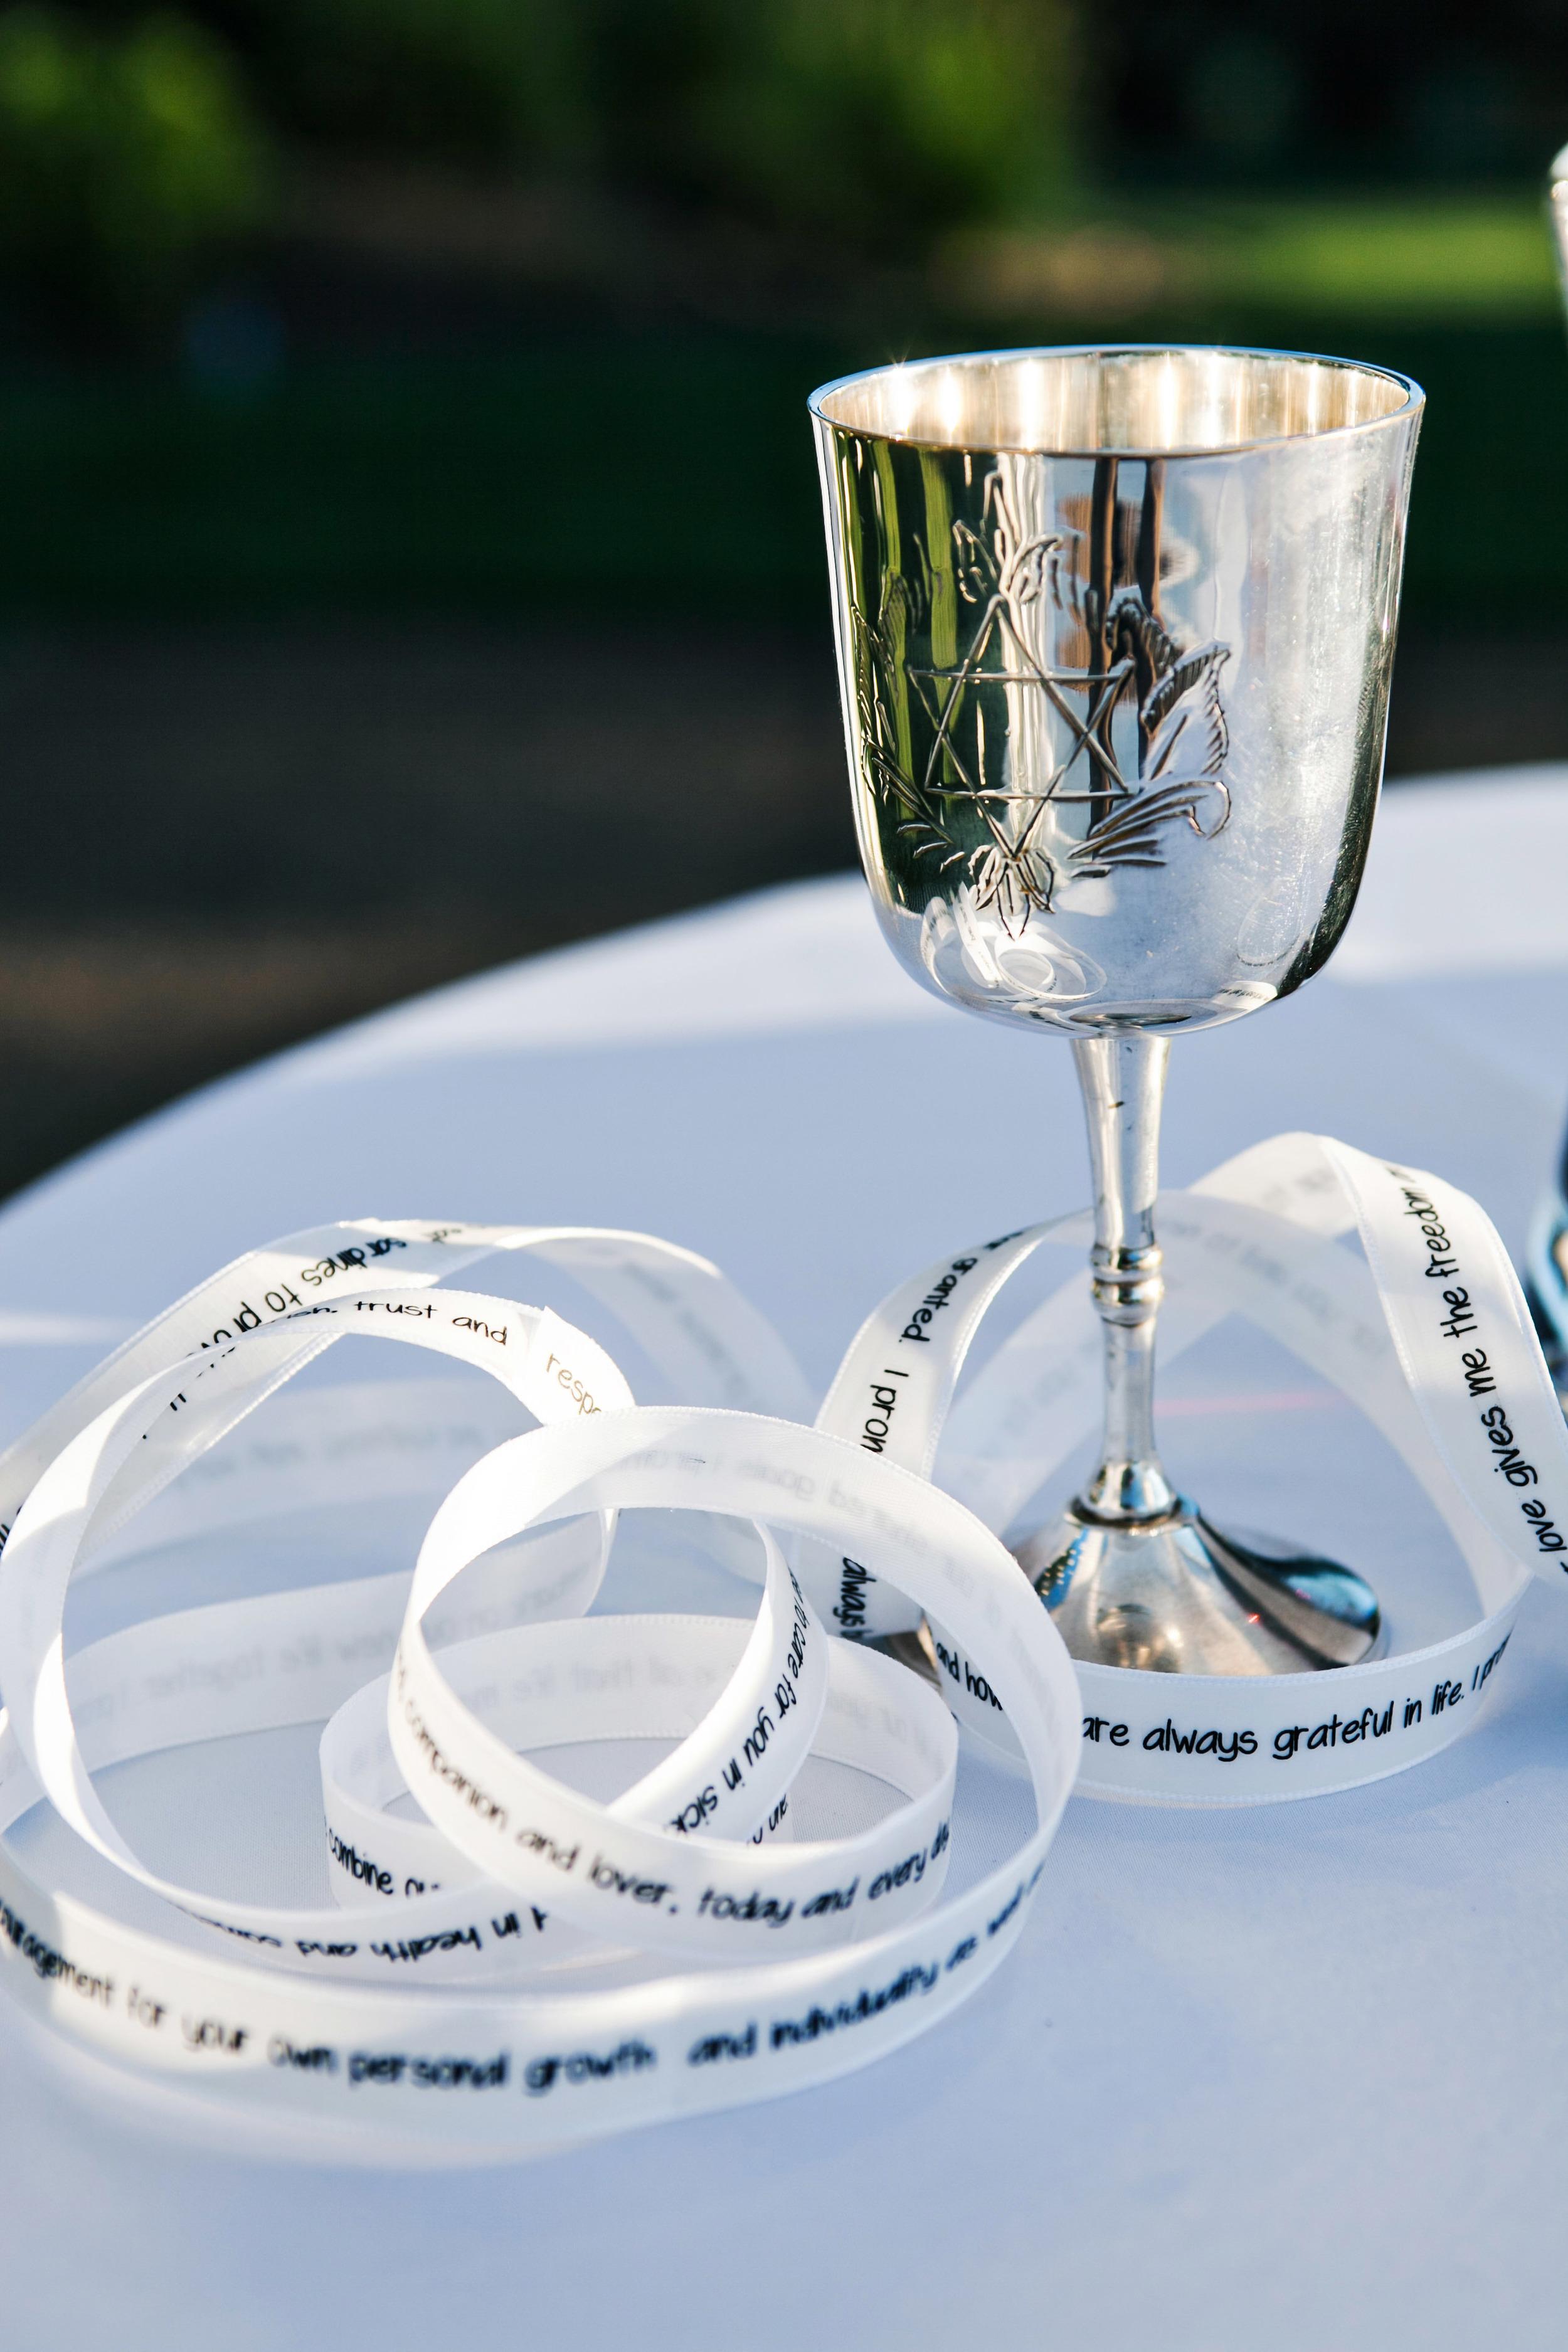 08. RS - Ceremony vows on ribbon, kiddish cup, napa wedding, jewish wedding, vineyard ceremony.jpg